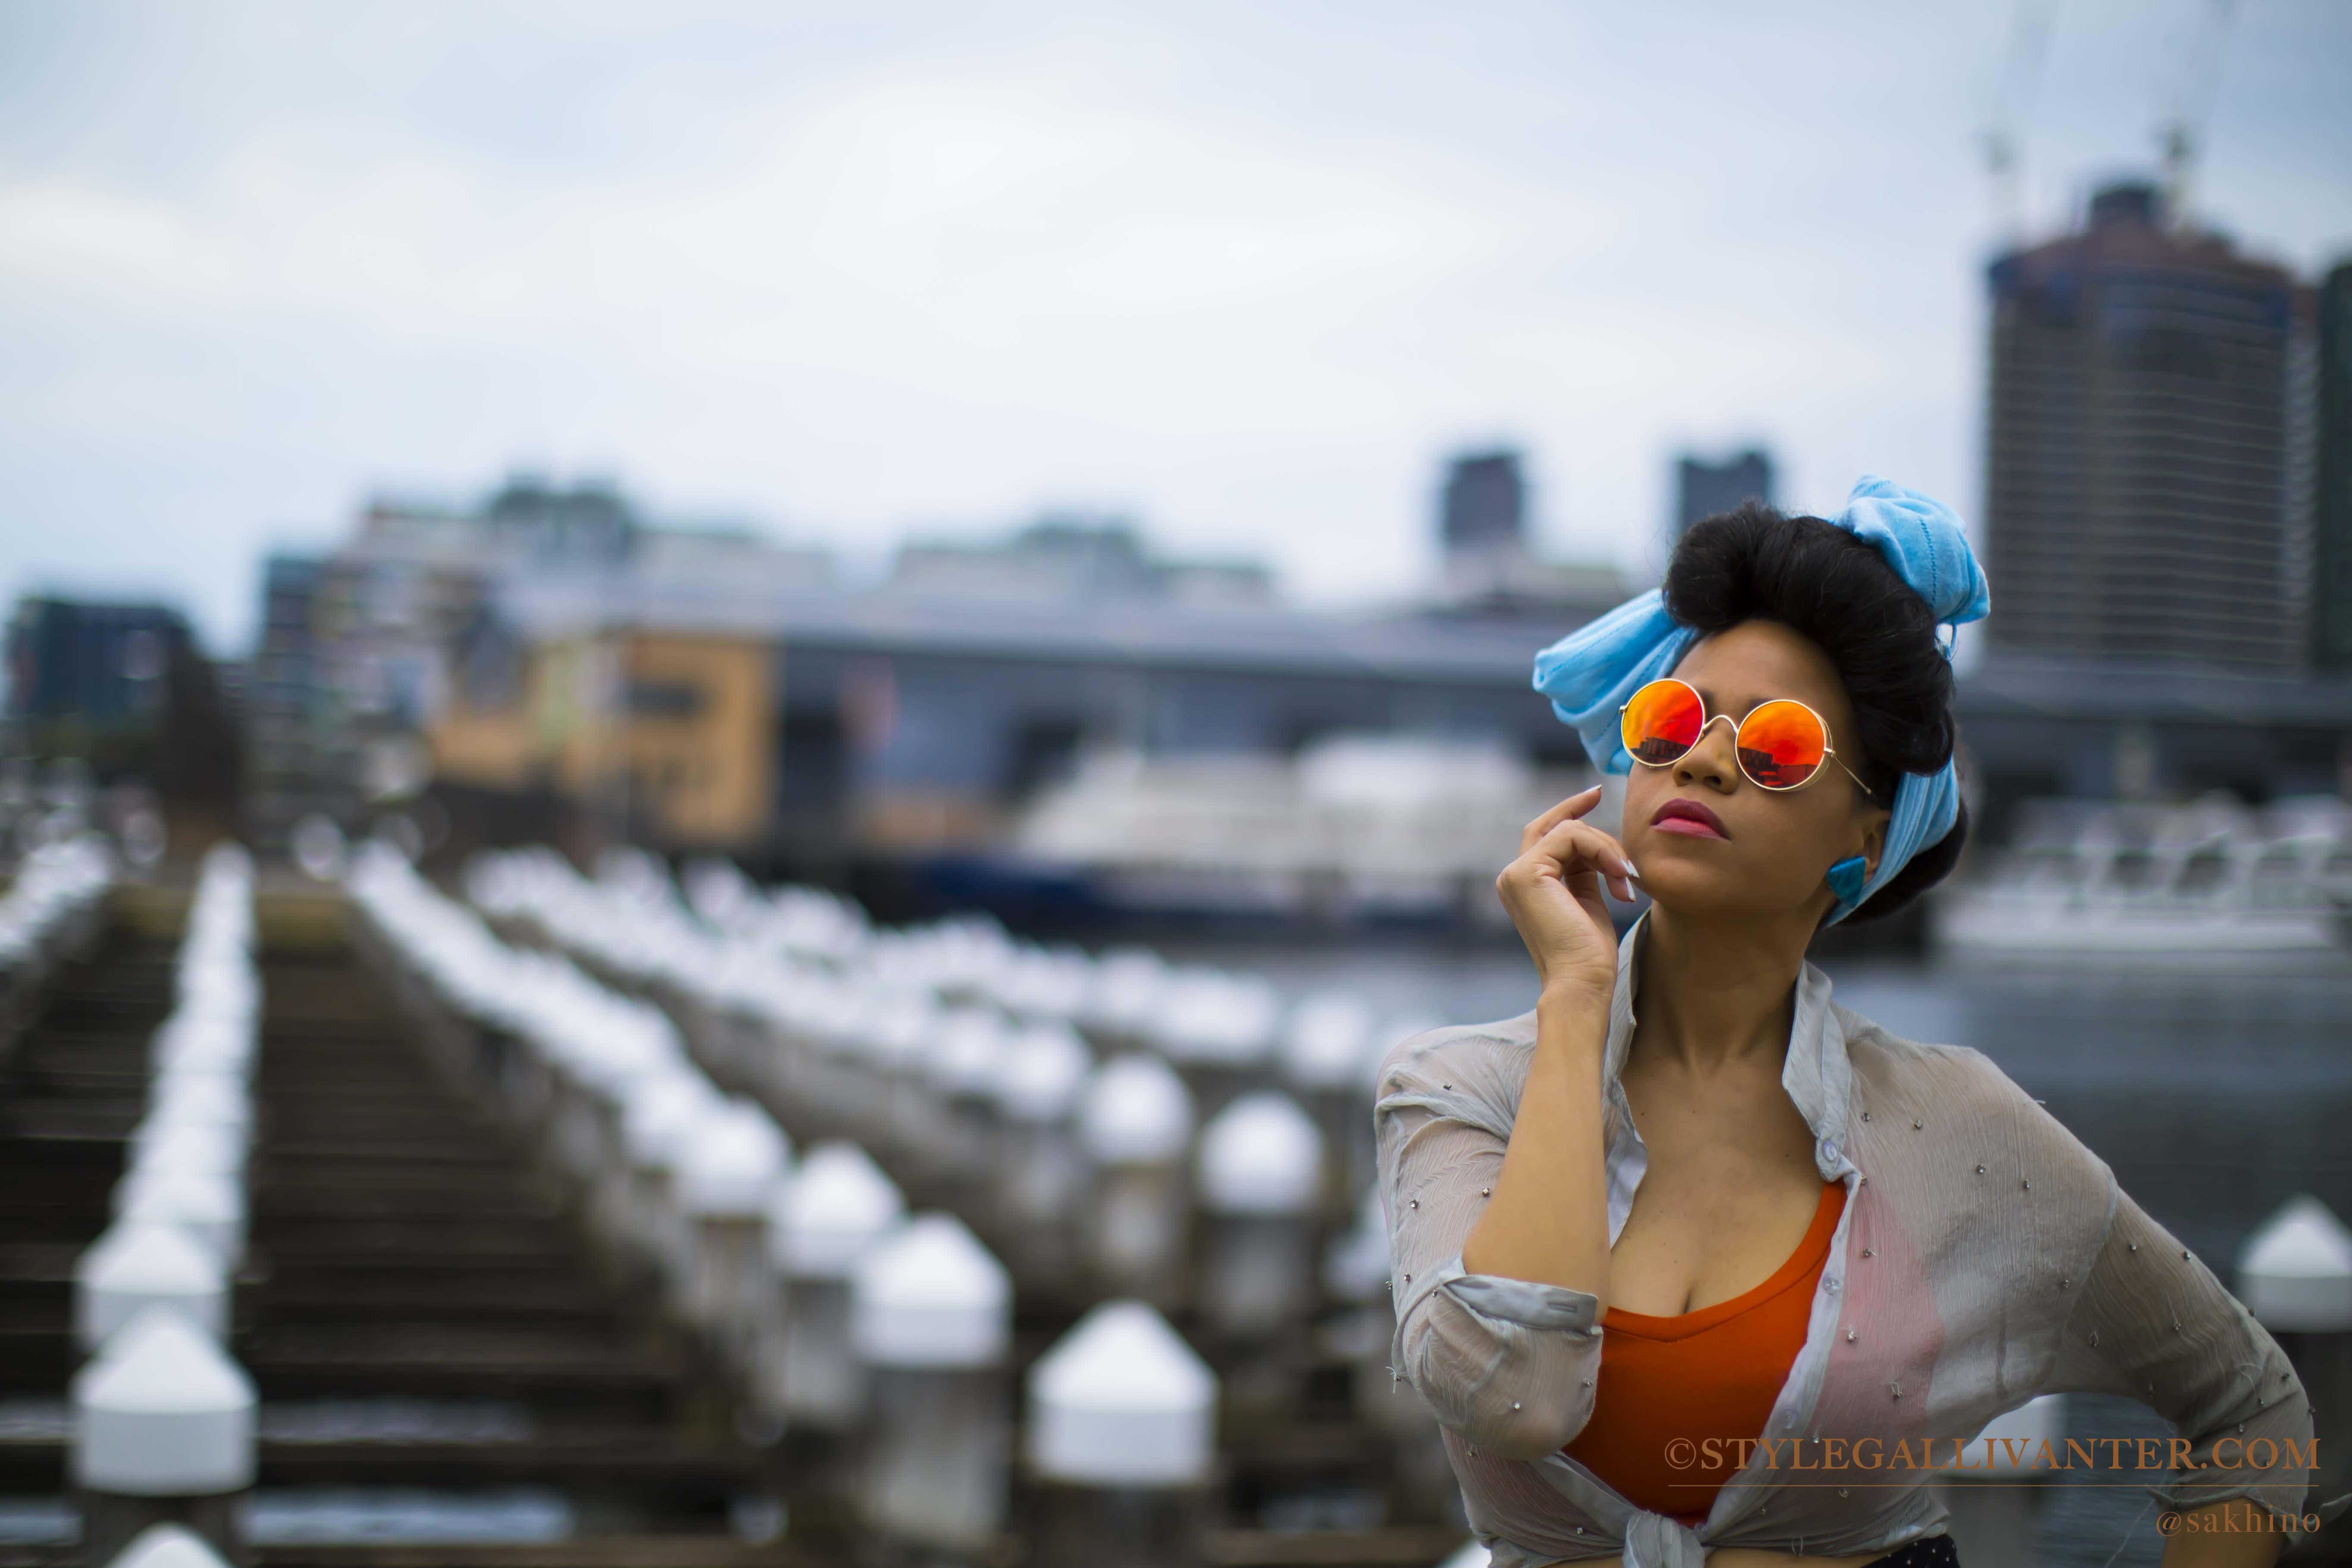 orange-sunglasses_top -australian-bloggers-2016_top-natural-hair-bloggers-2016_womens-trends-2016-4